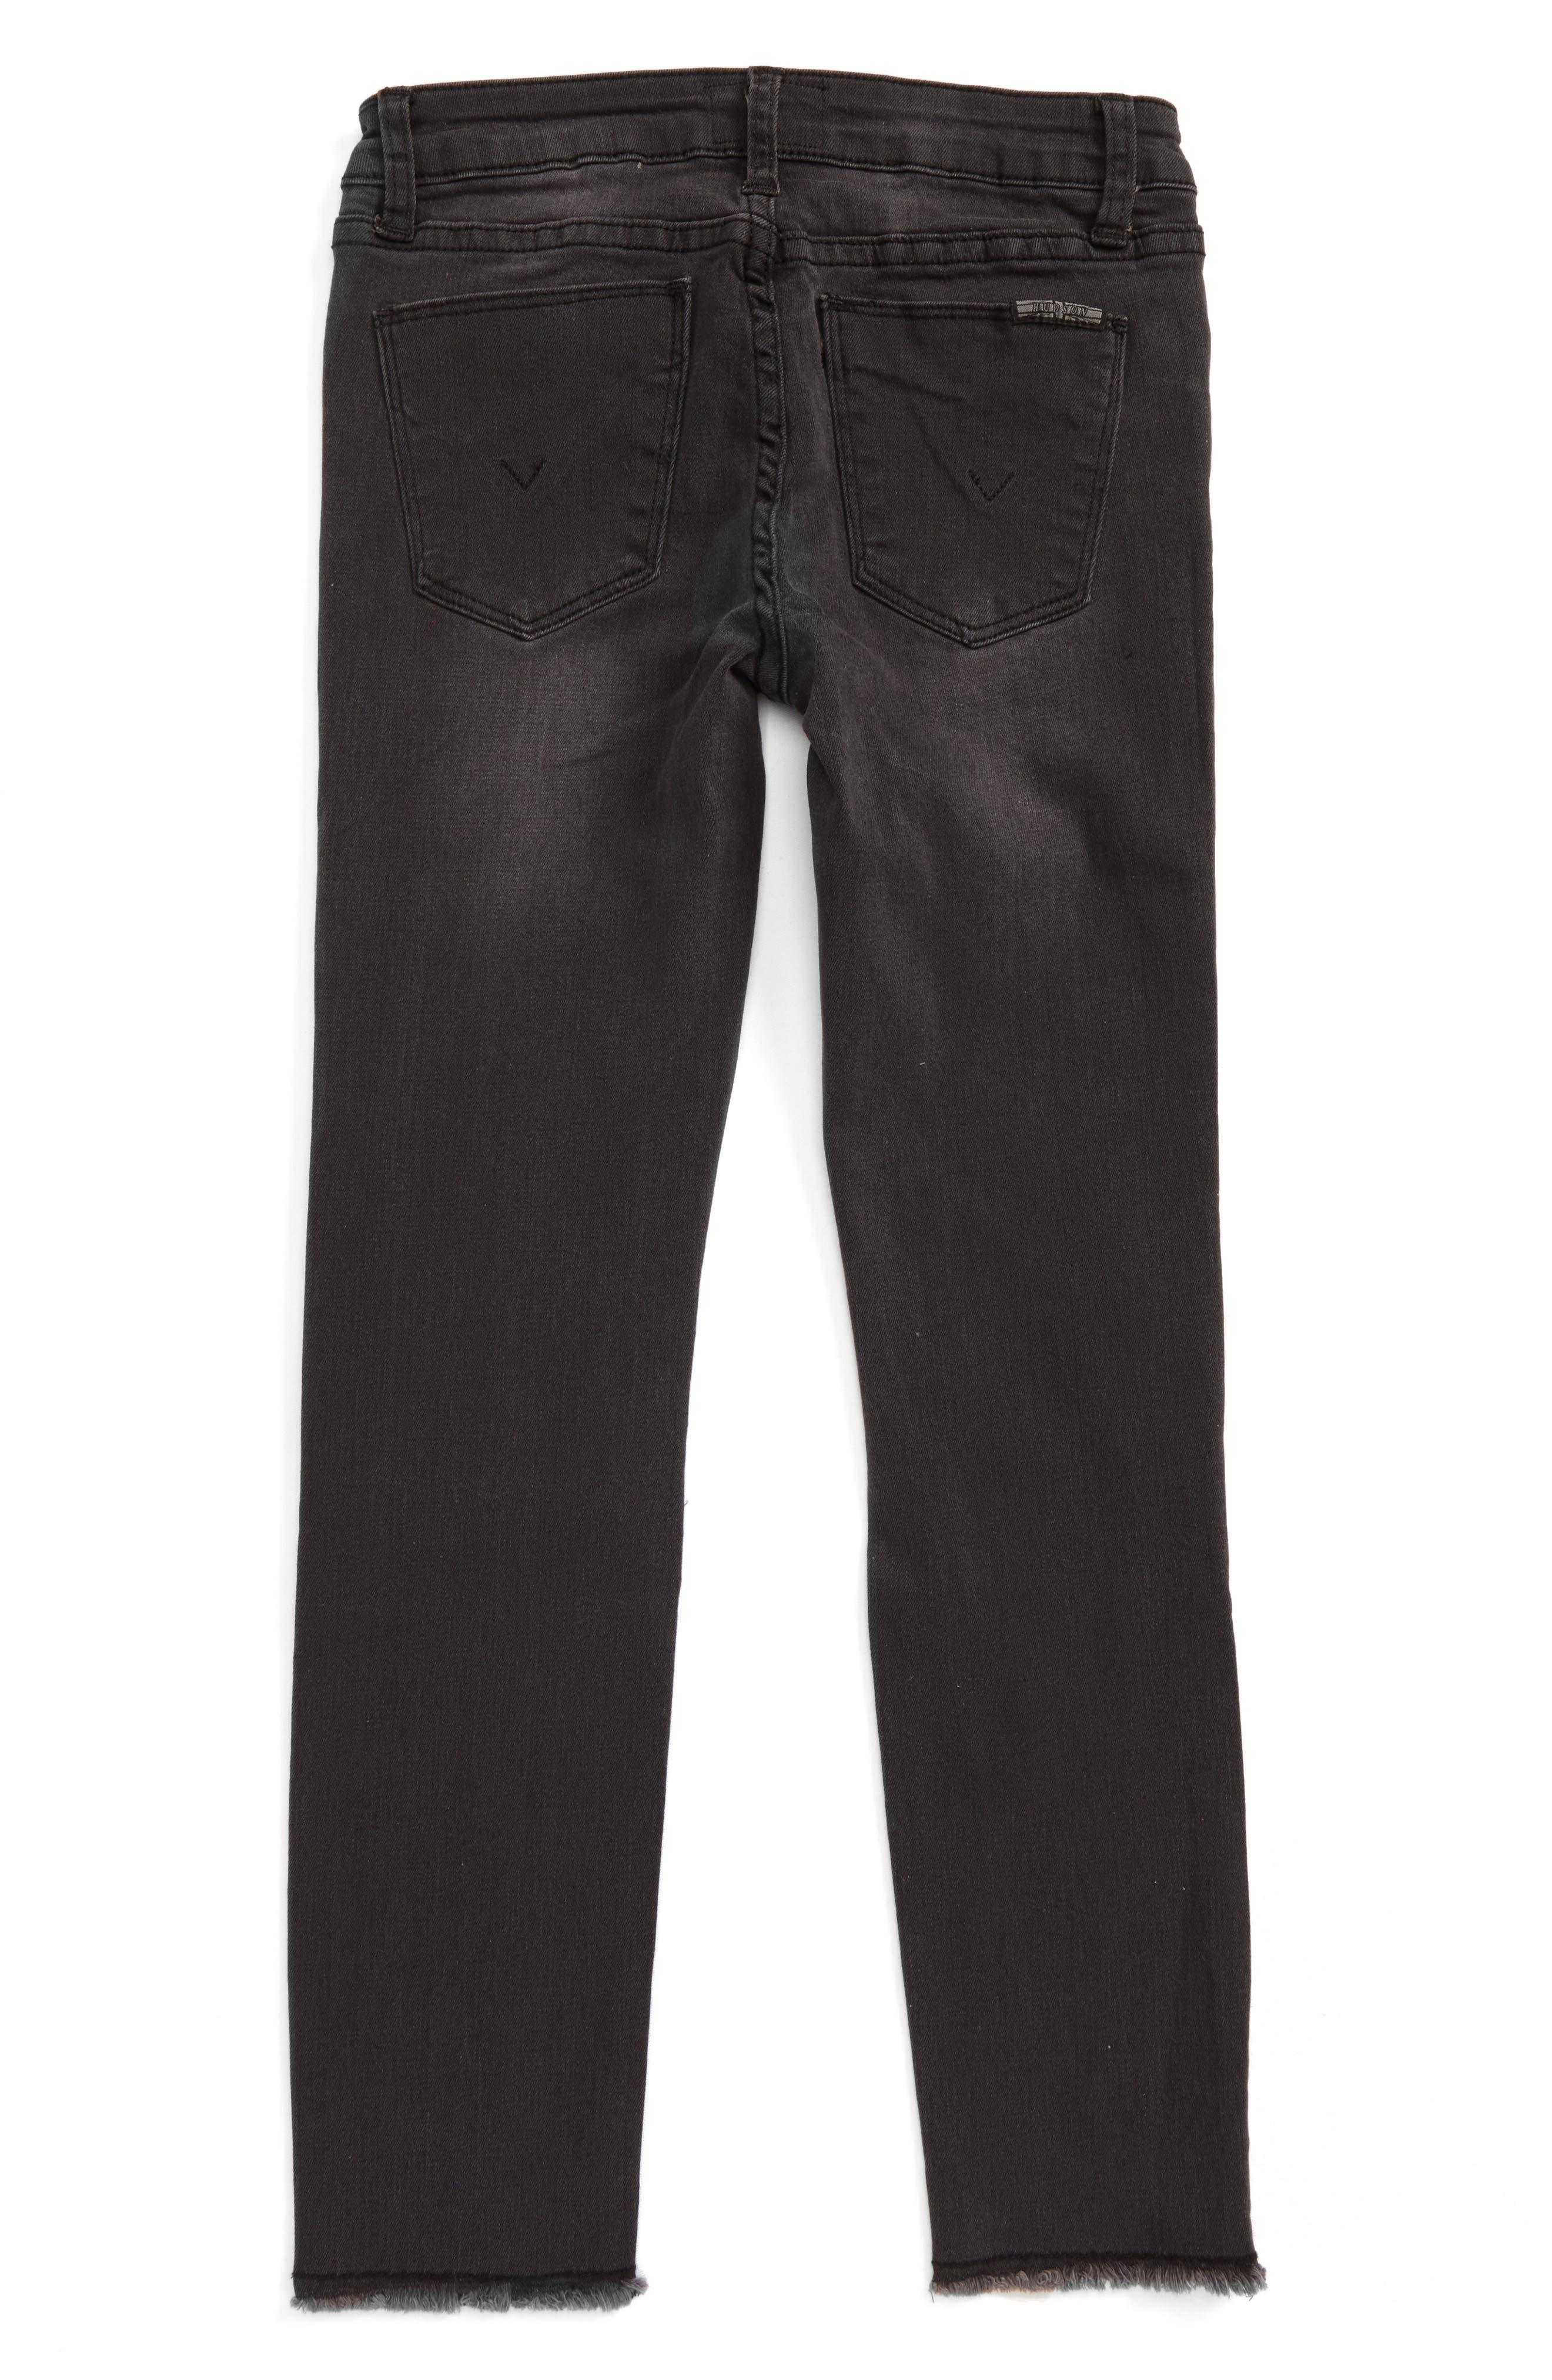 Black Iris Skinny Jeans,                             Alternate thumbnail 2, color,                             008